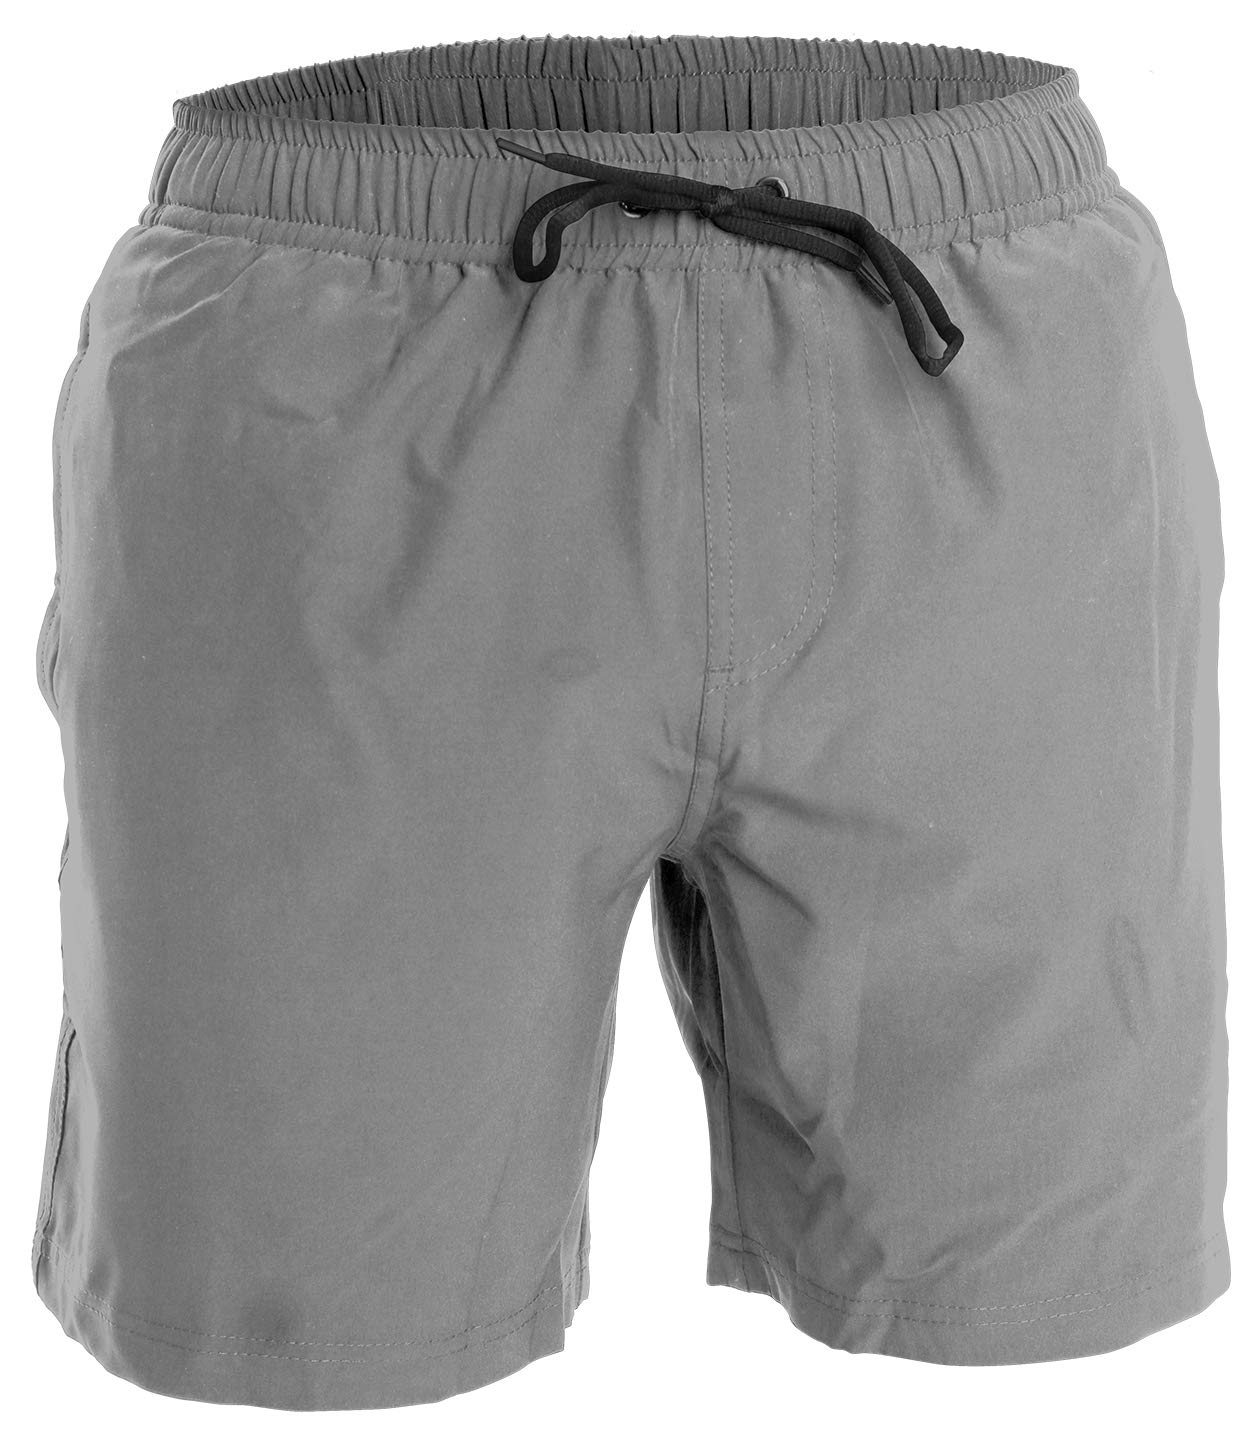 Mens Swim Trunks Workout Shorts